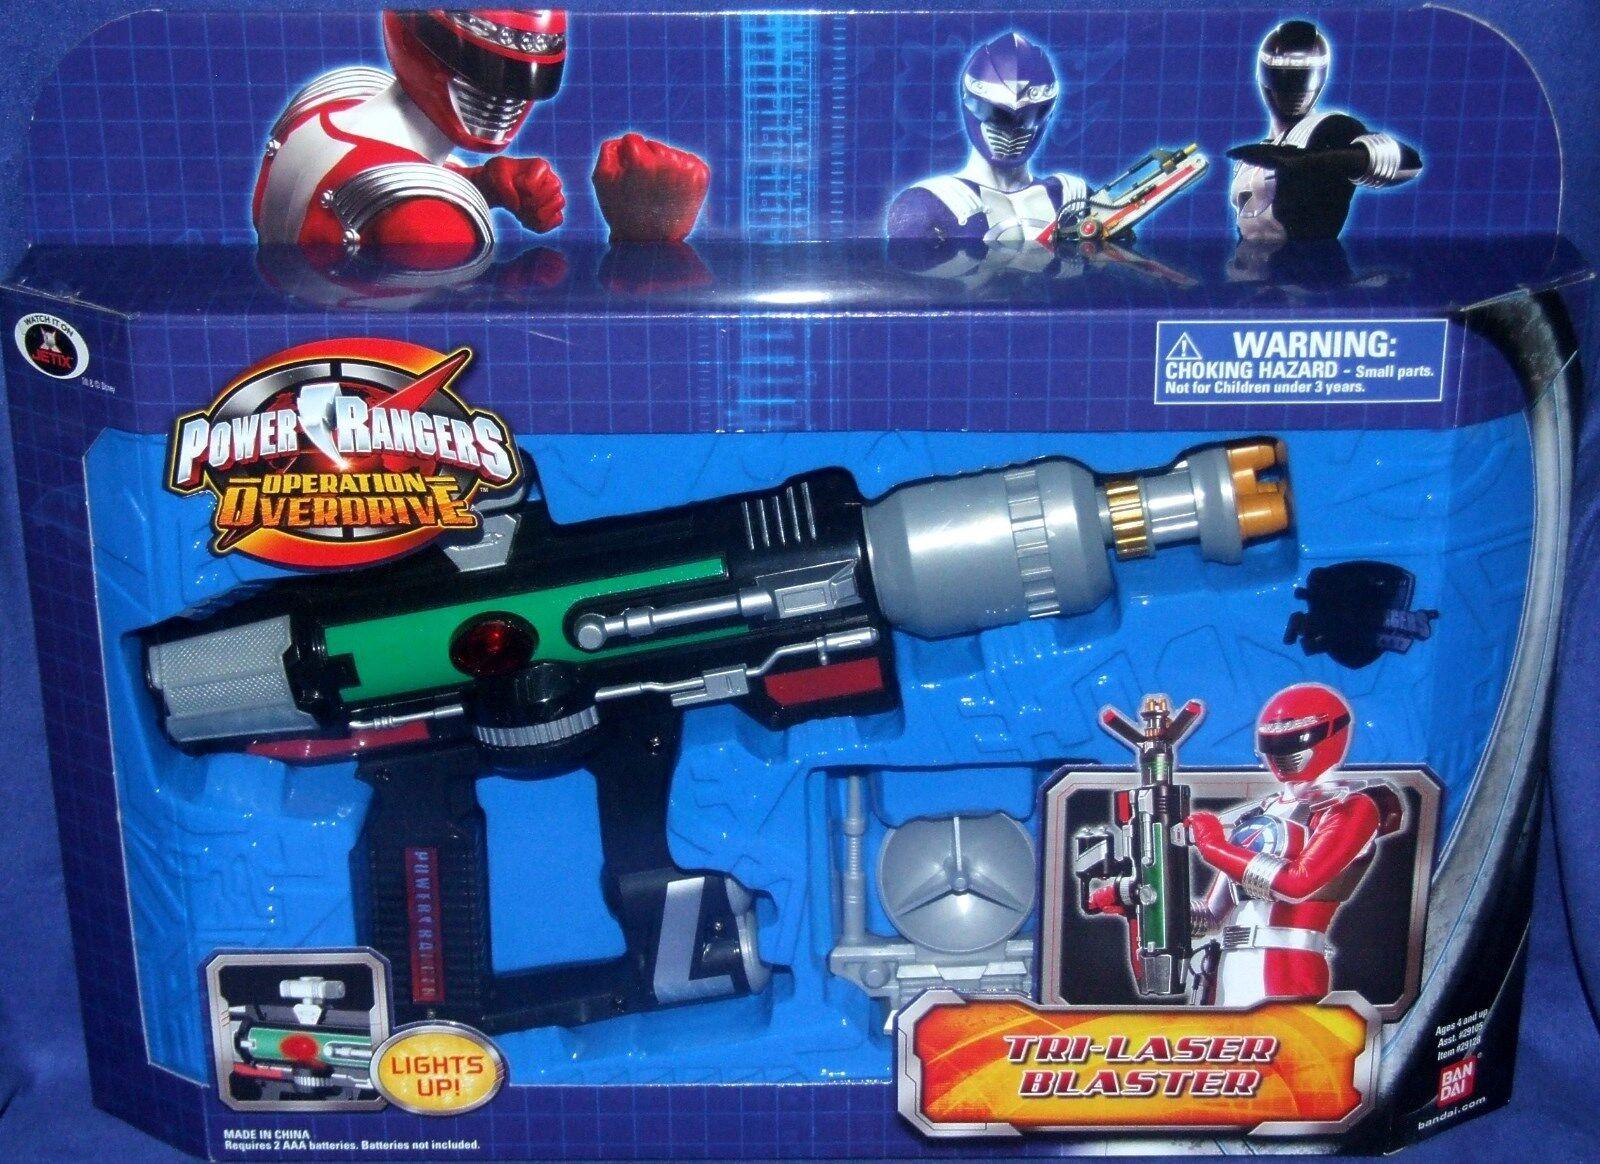 Power Rangers Operation Overdrive electrónica Tri Laser Blaster nuevo sello de fábrica